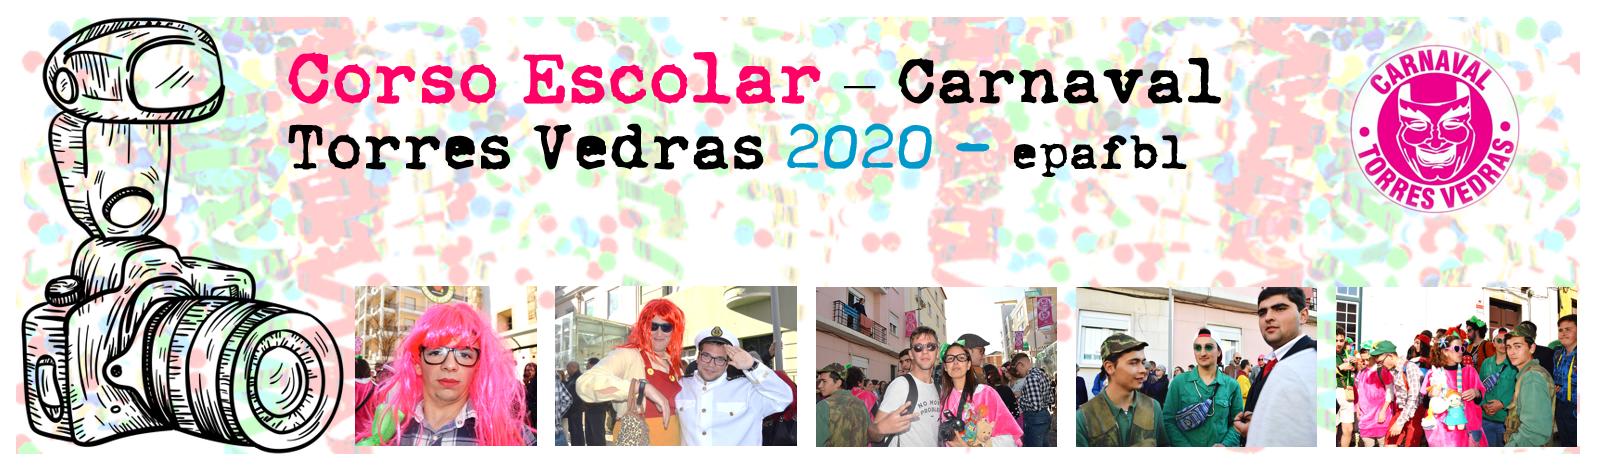 epafbl no Carnaval de Torres Vedras 2020